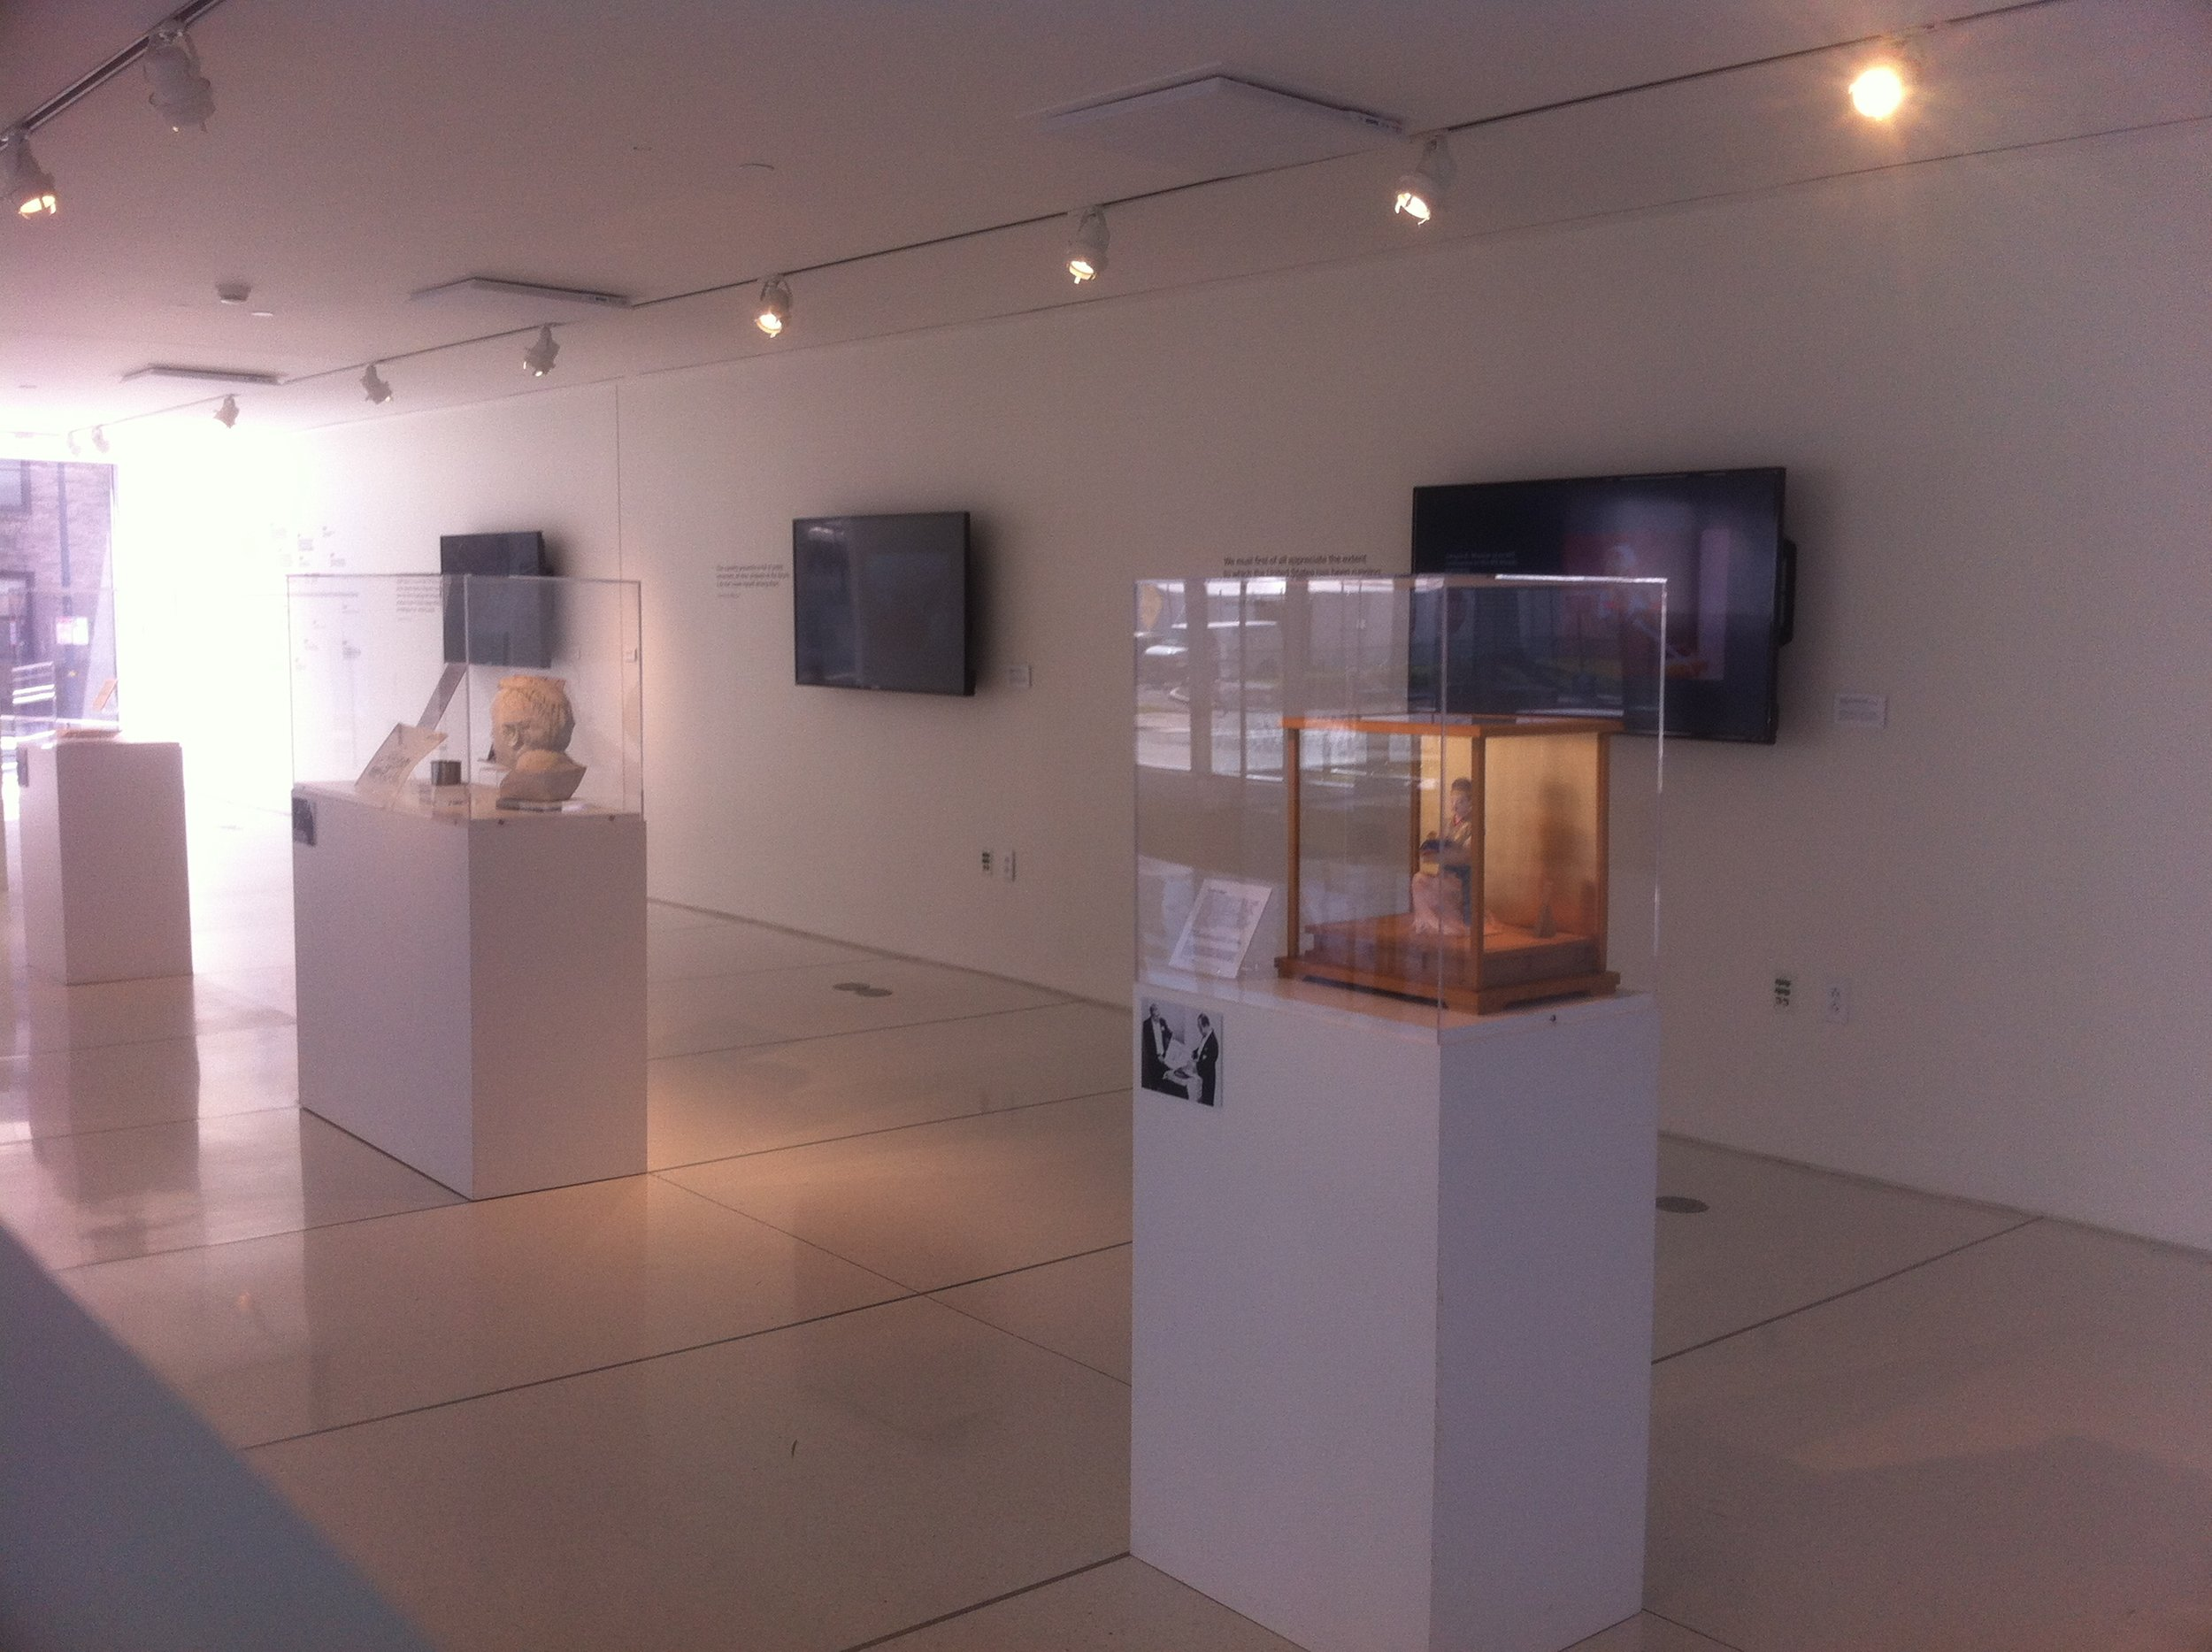 MIT Media Lab Lobby.JPG